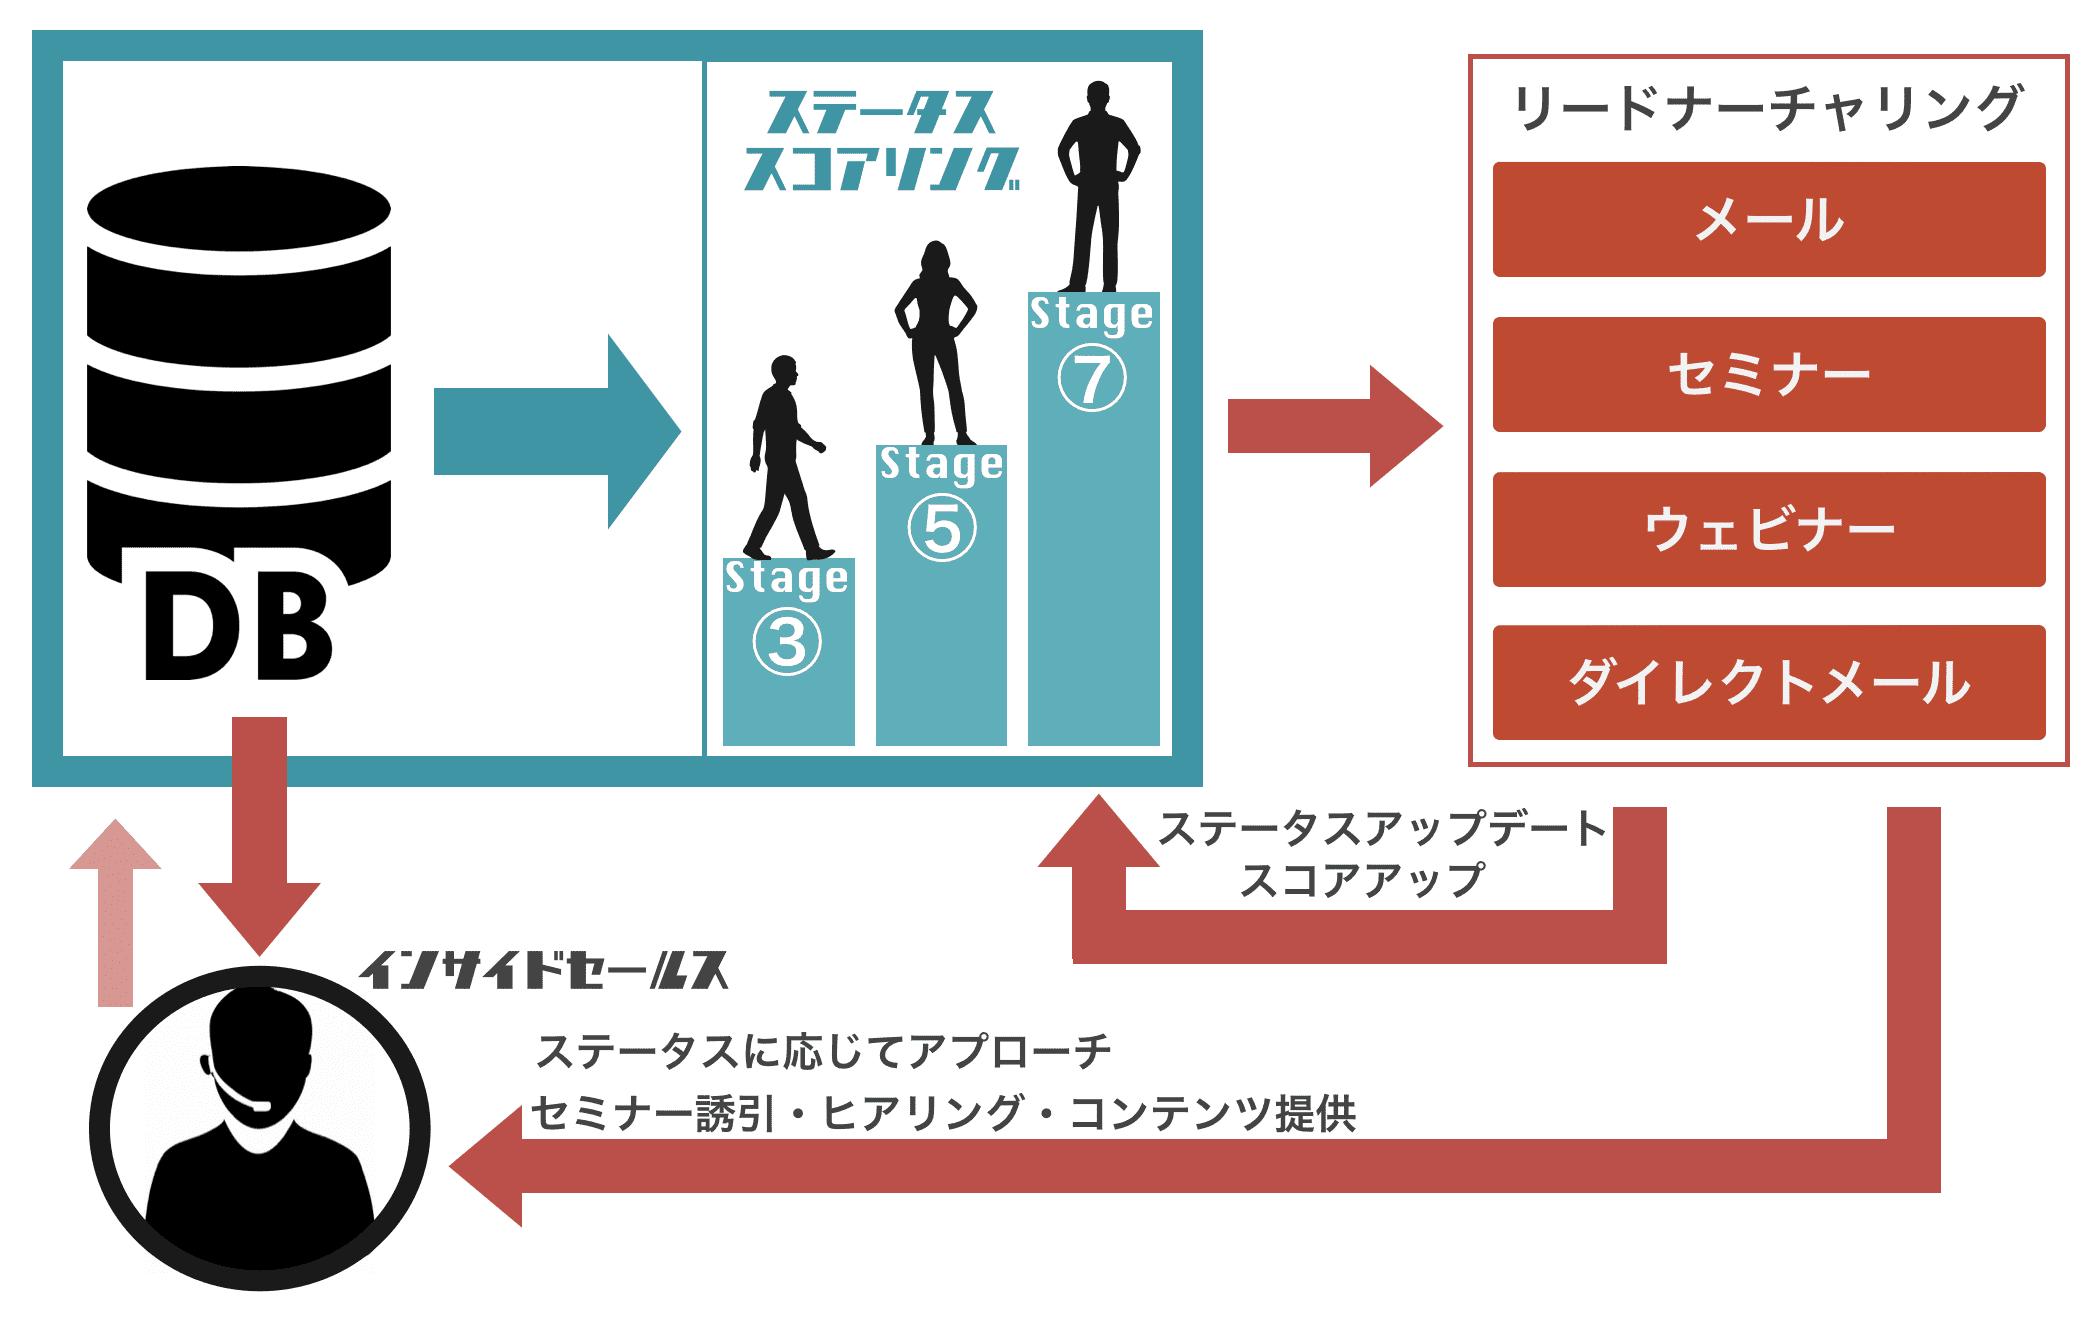 hajimari リードナーチャリング